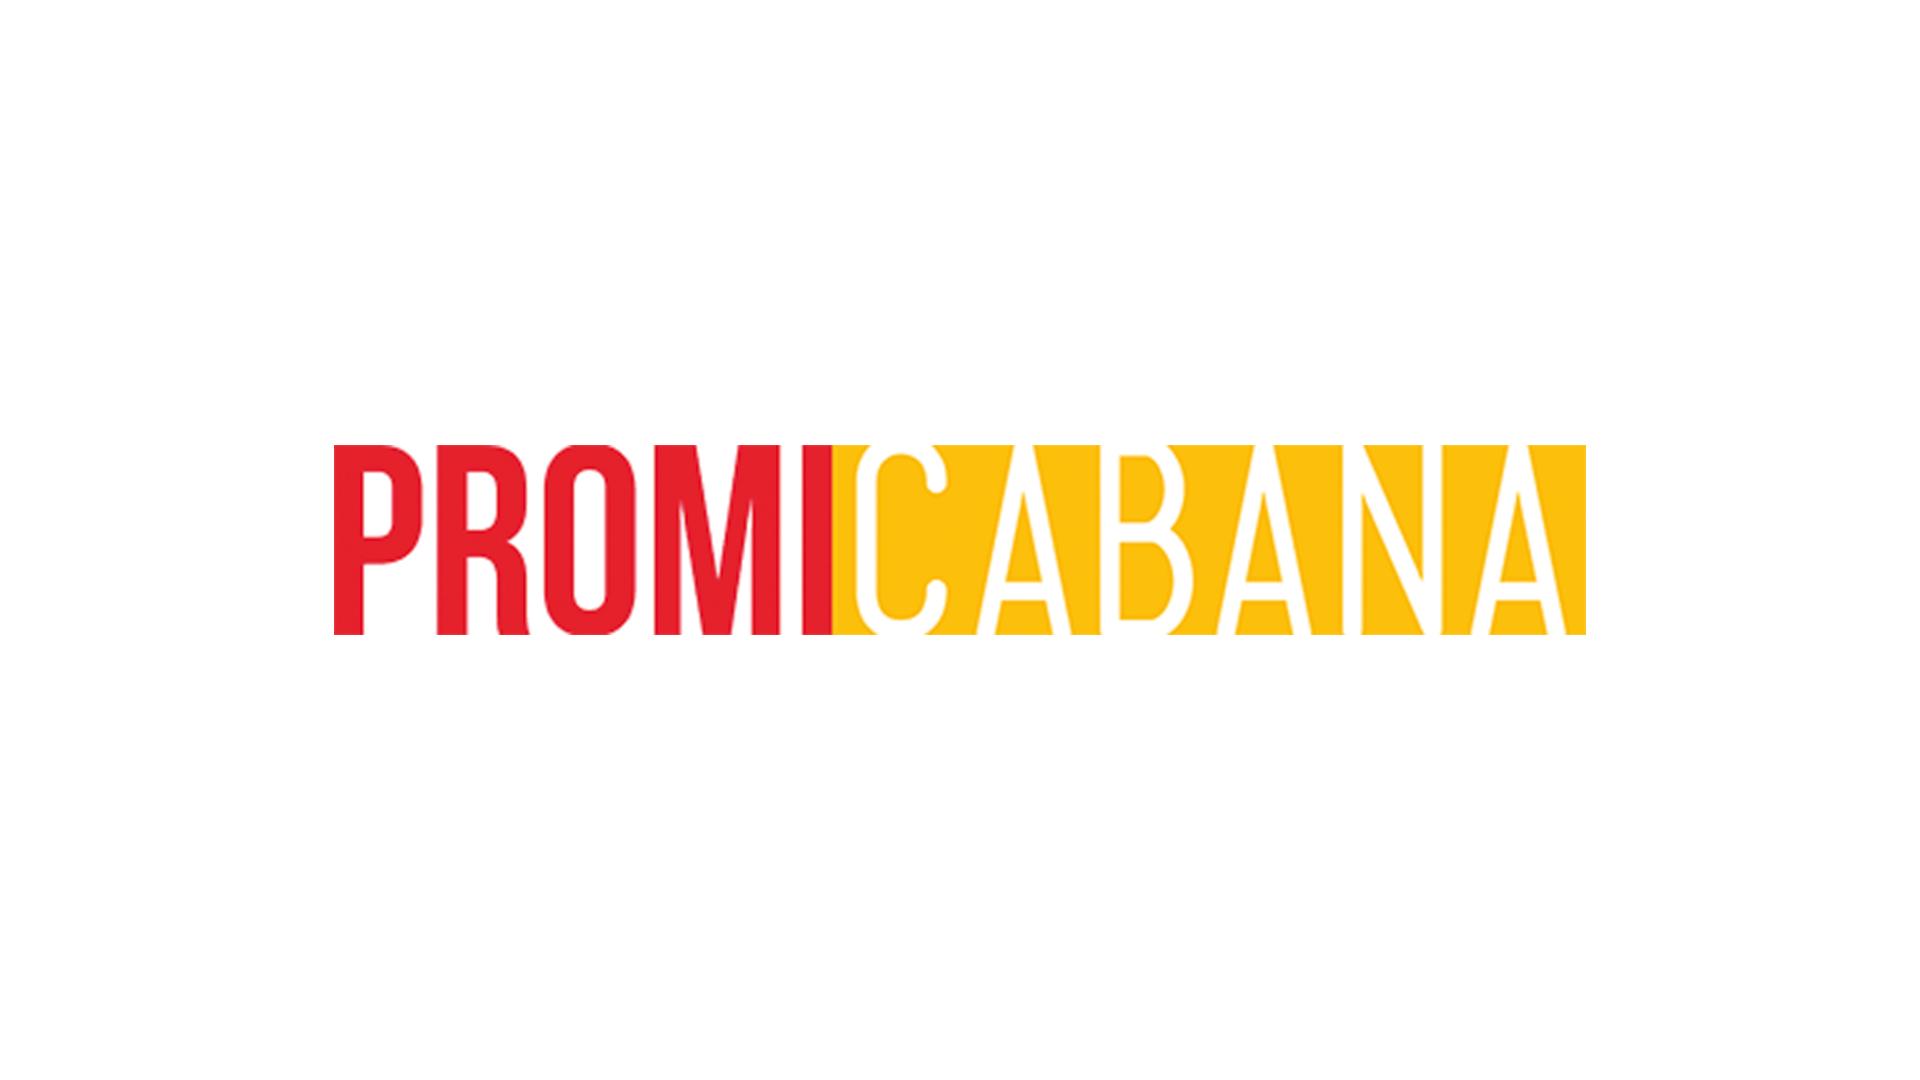 Jessica-Alba-Teen-Choice-Awards